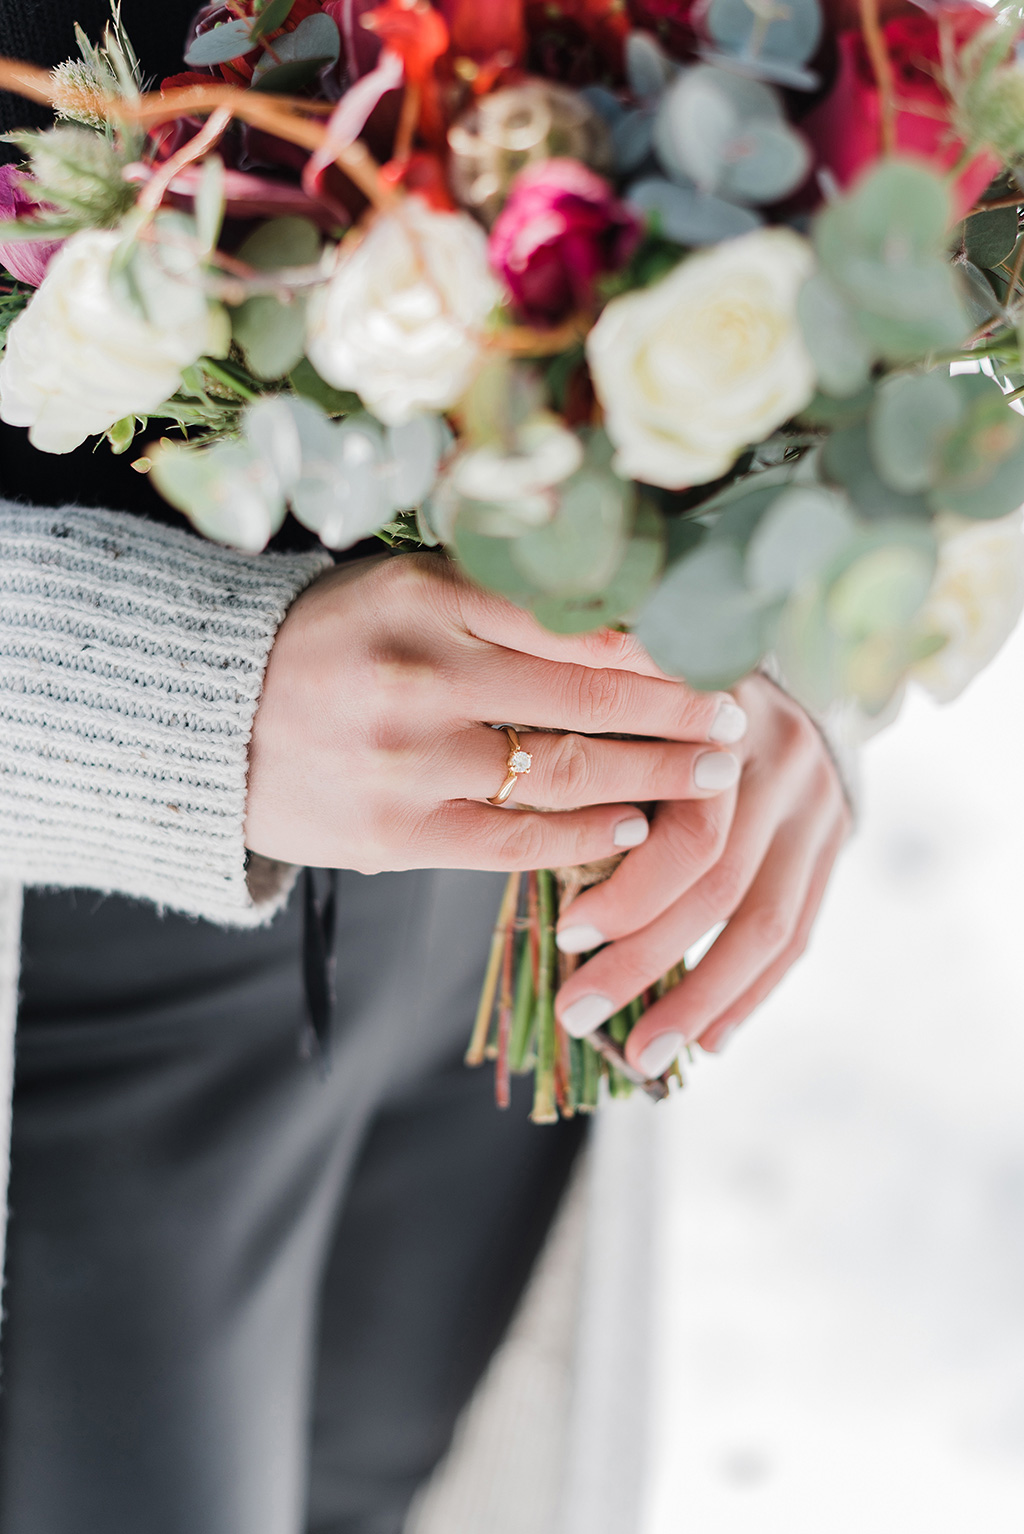 Prewedding φωτογράφιση στα χιόνια, δακτυλίδι αρραβώνων, George Kostopoulos Fine Art Wedding Photography